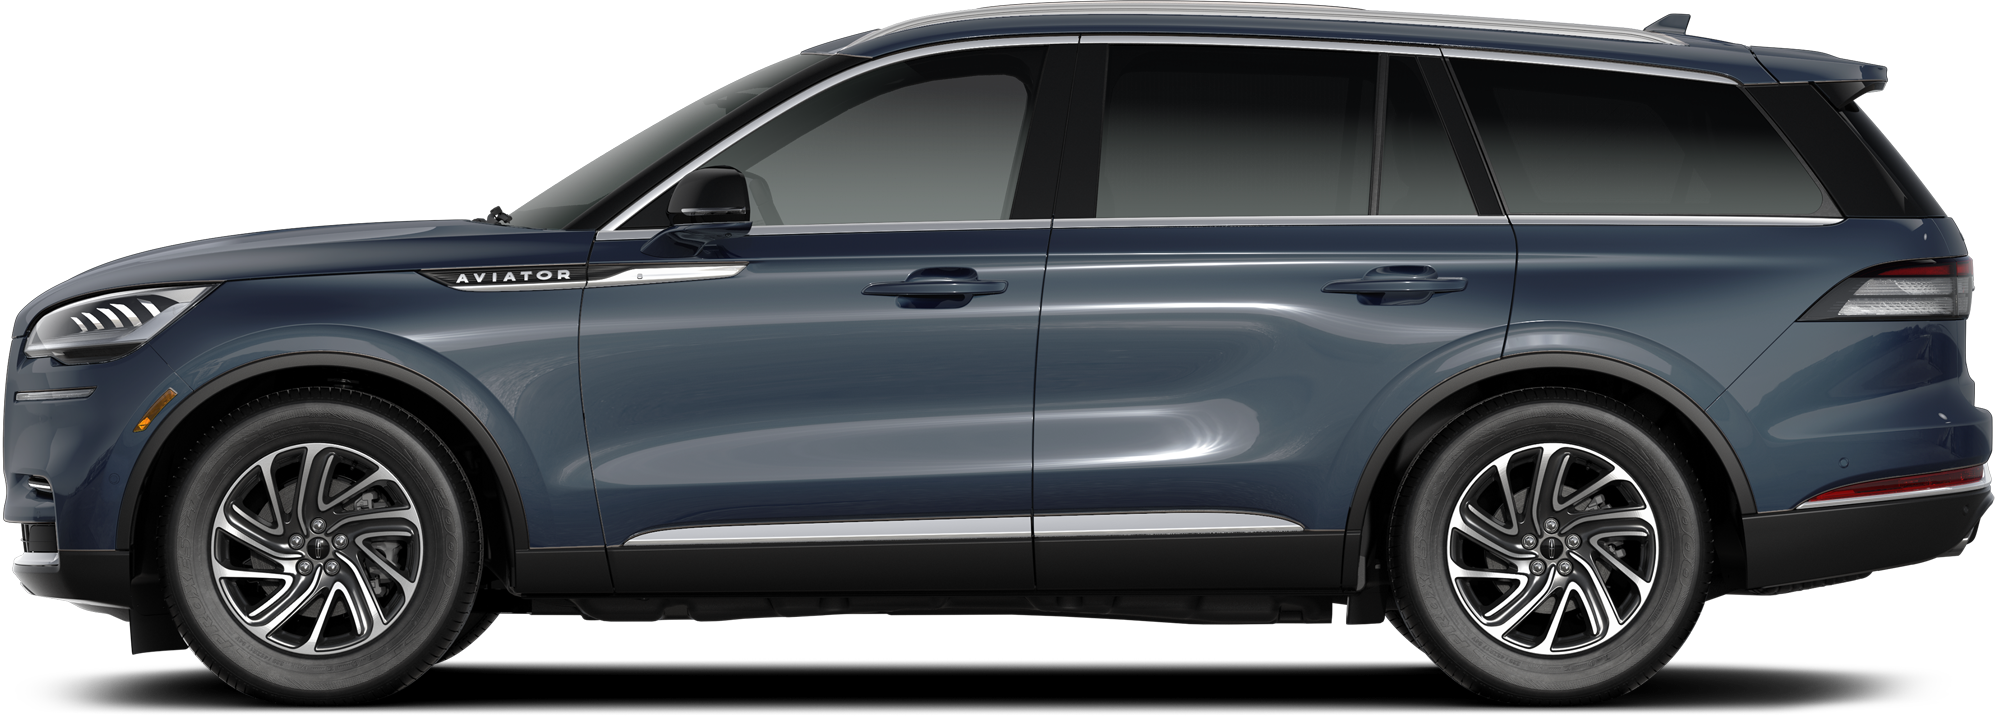 2021 Lincoln Aviator SUV Standard